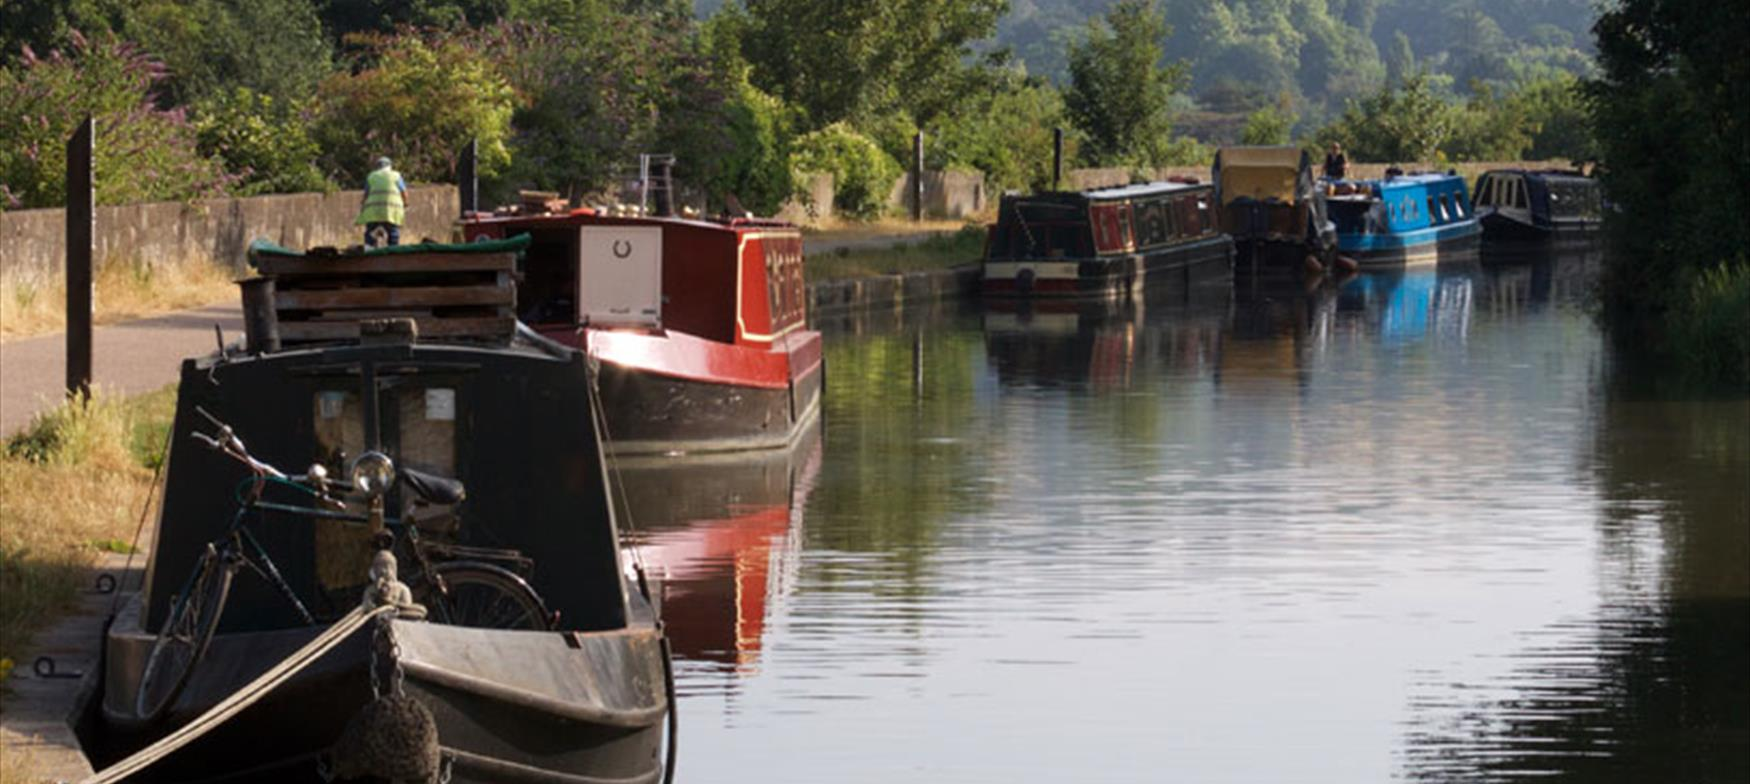 Narrowboats next to the towpath